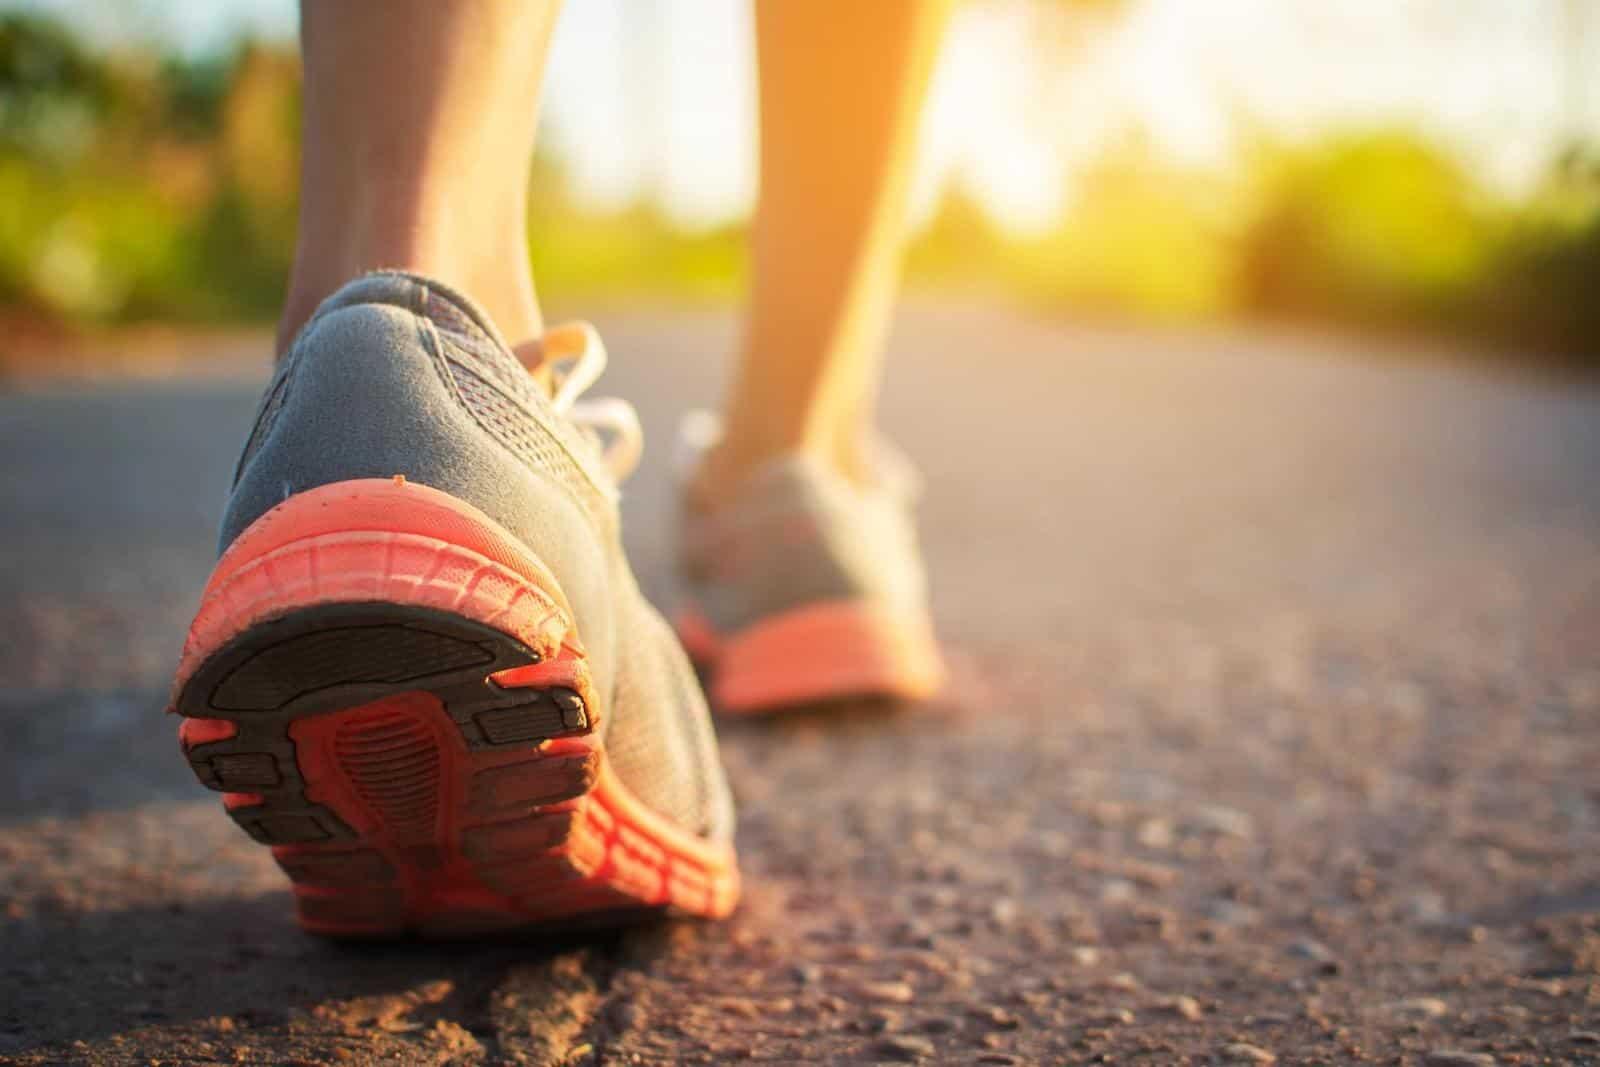 probiotics for bloating: walking